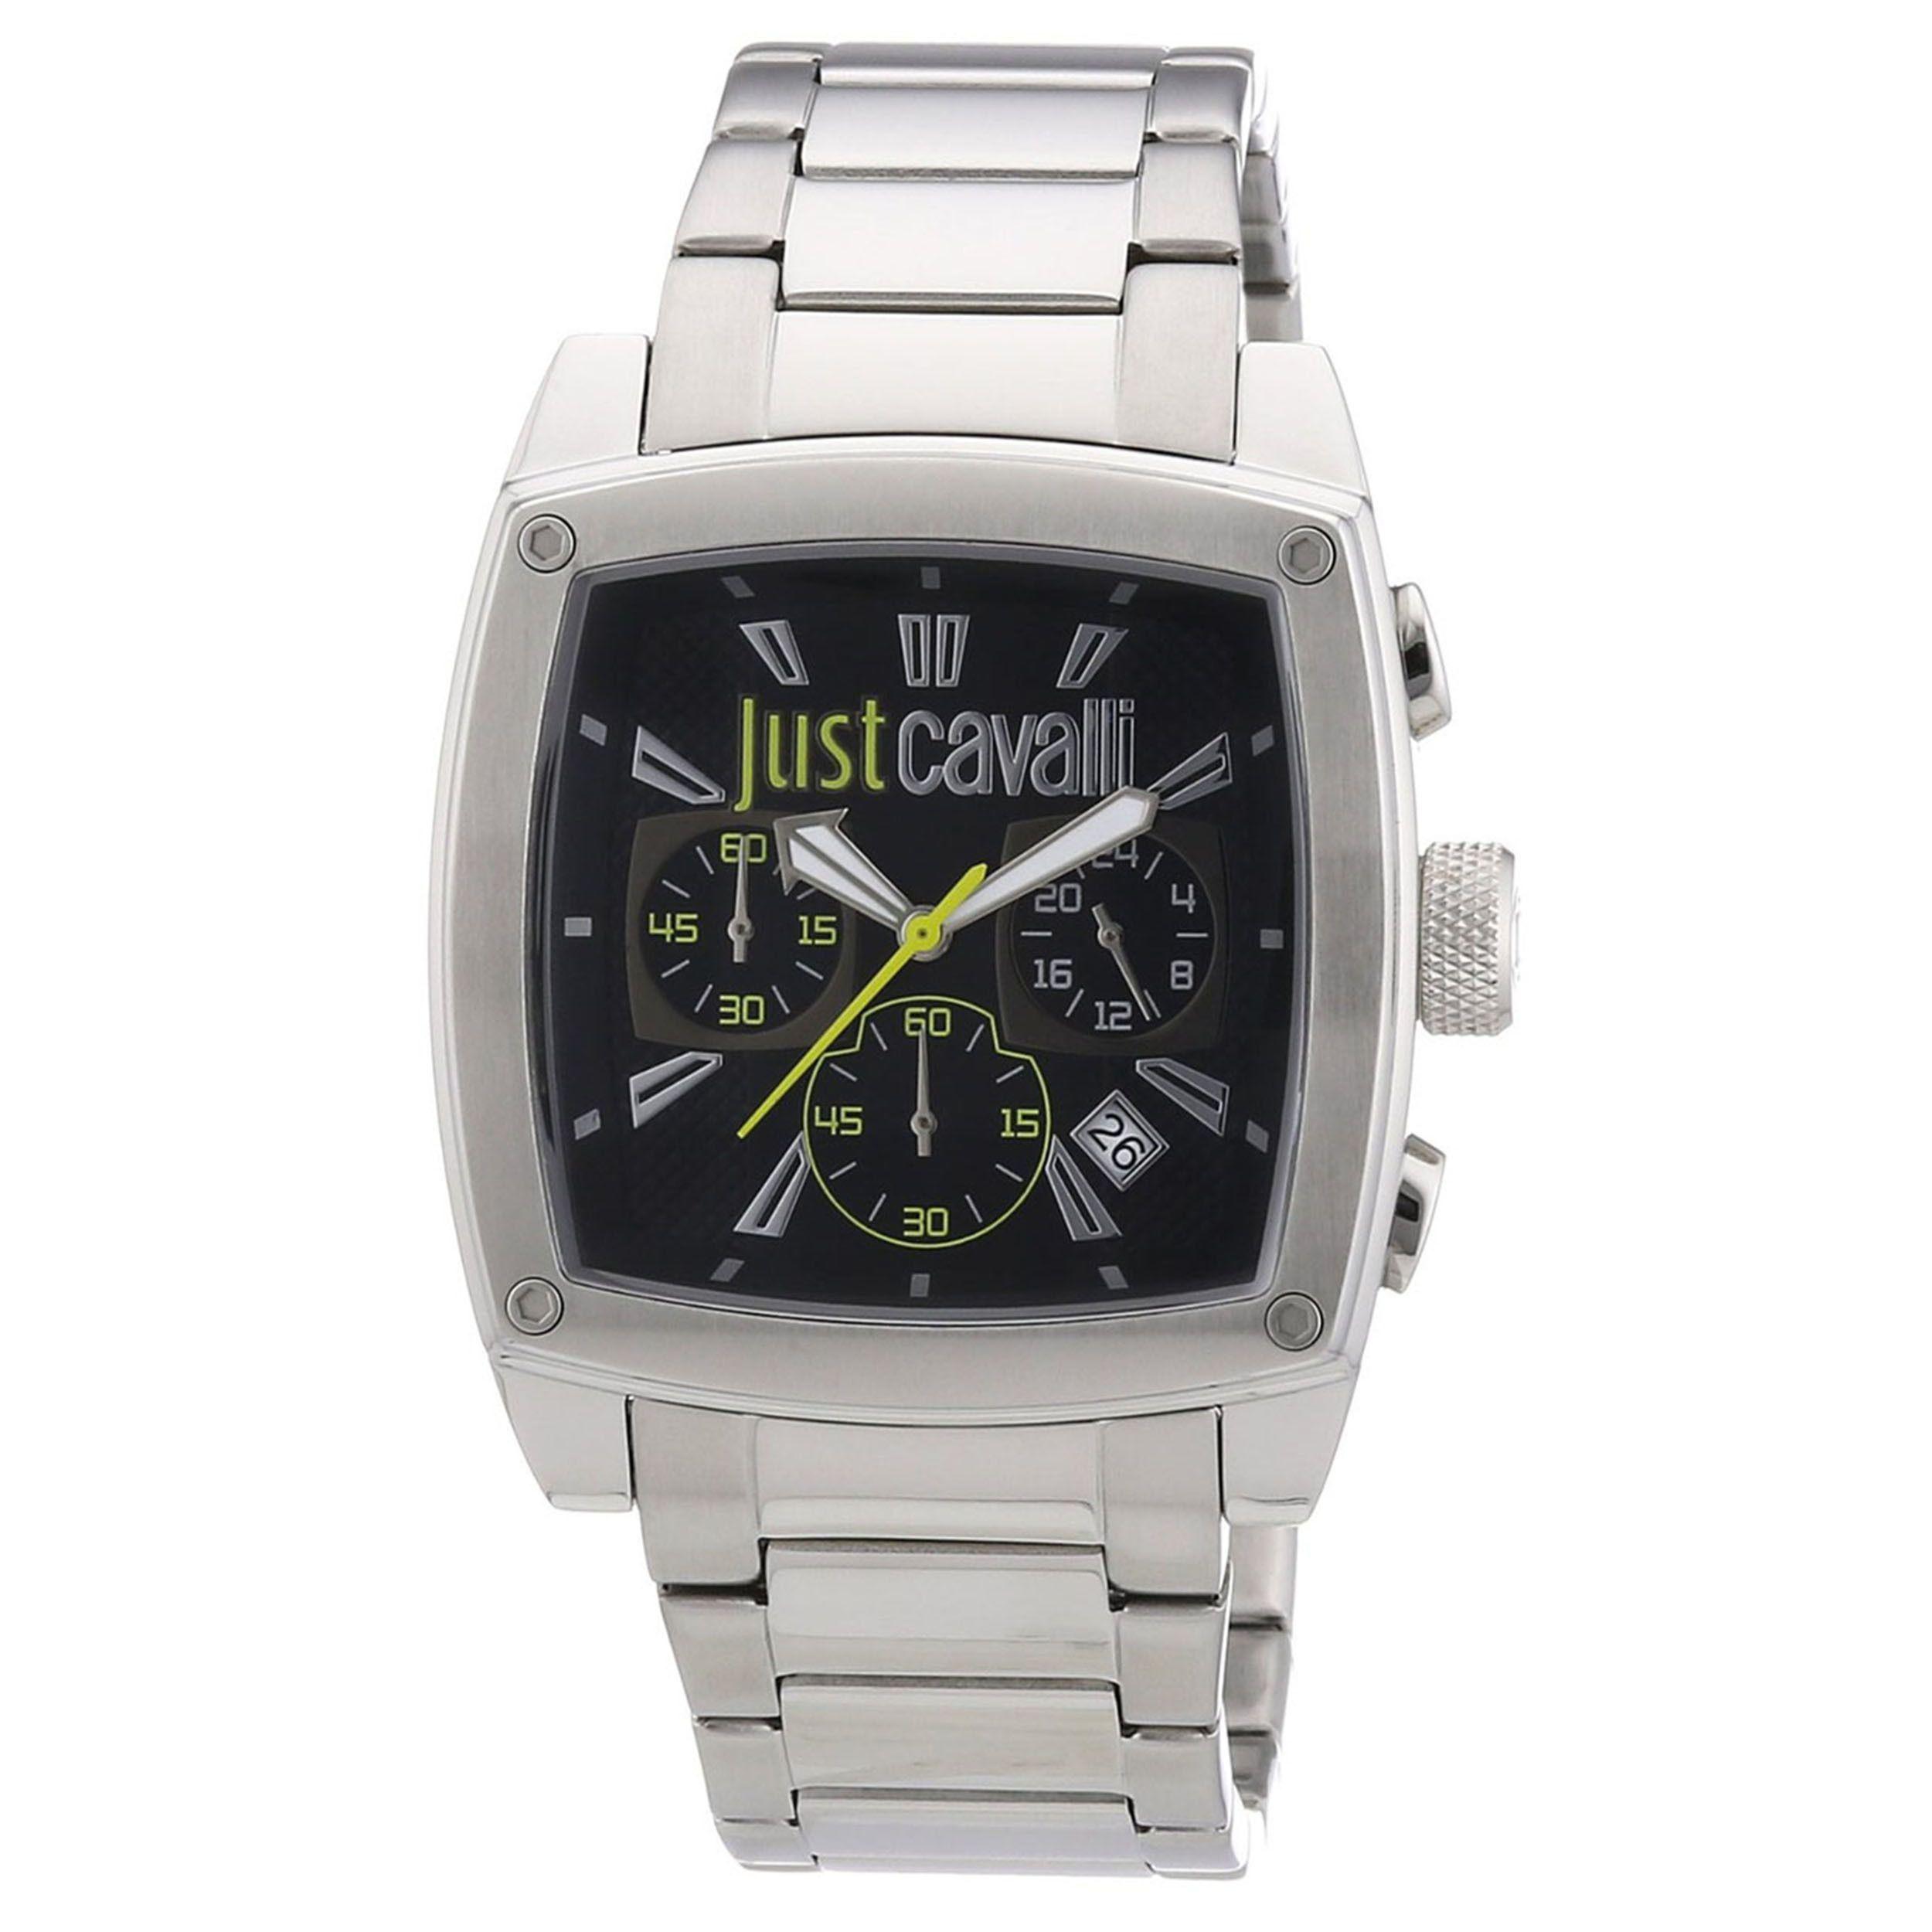 394a76a19f836 Just Cavalli Men s Pulp Chronograph Date Watch